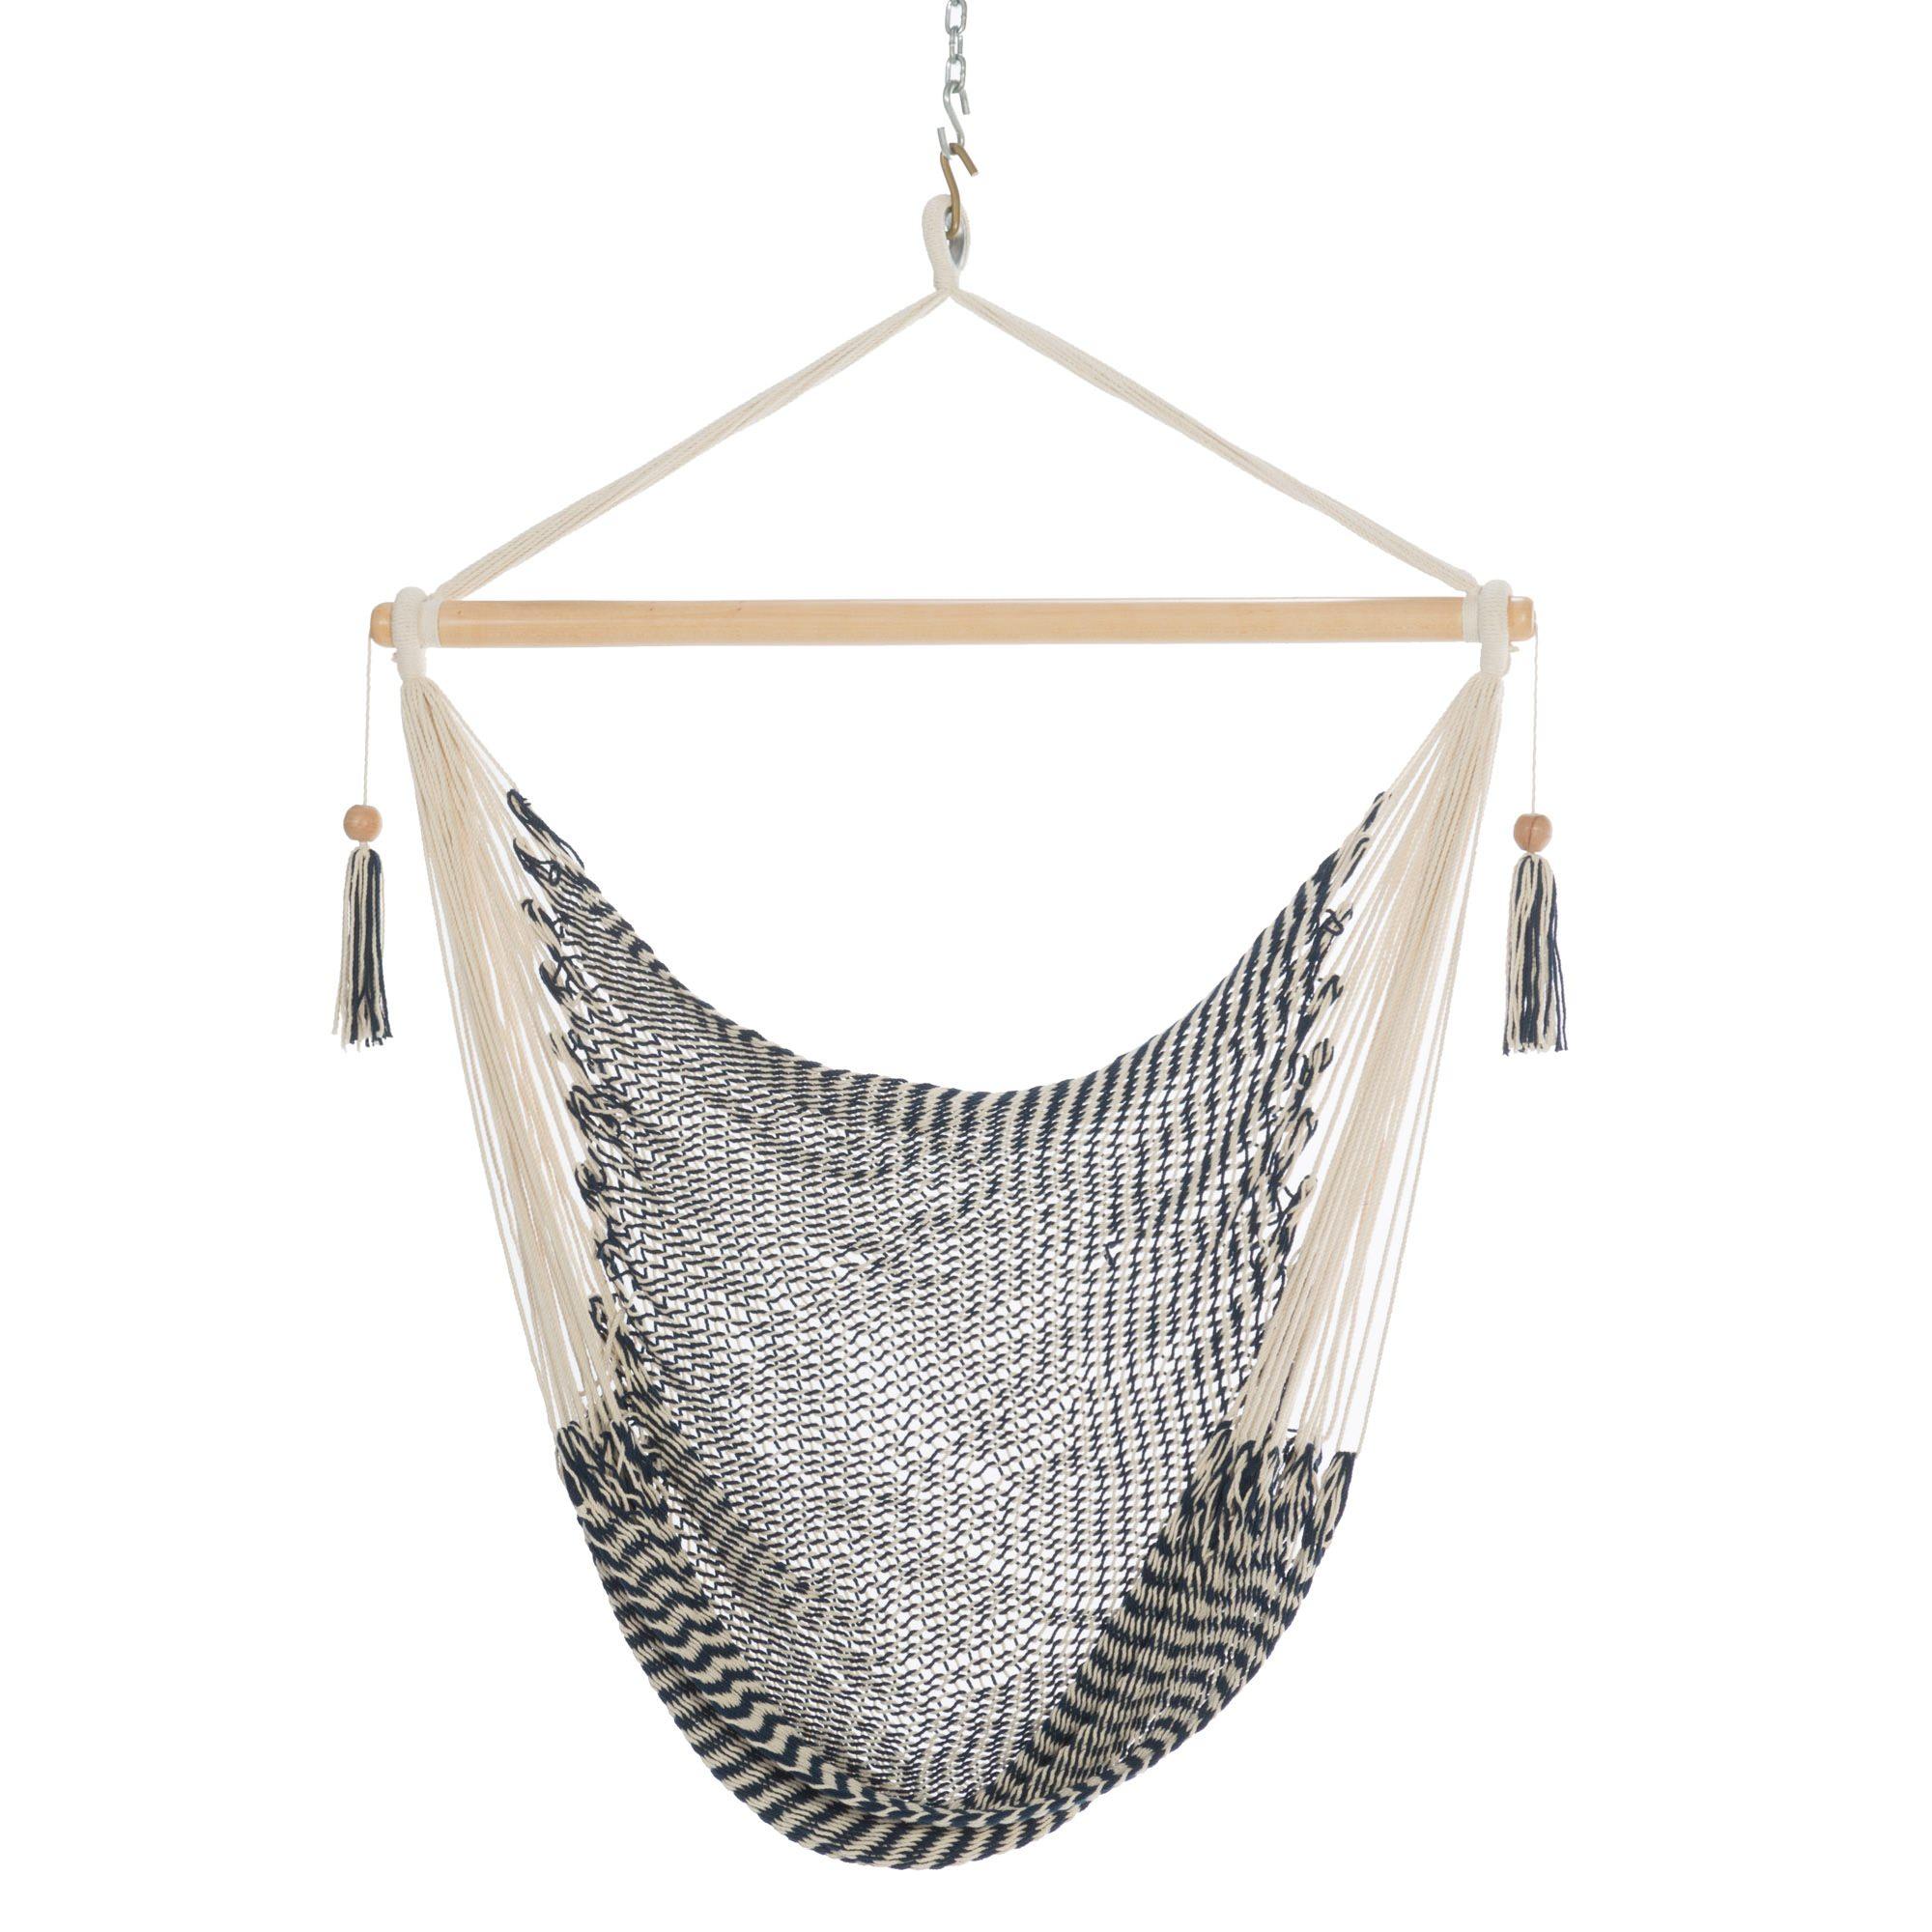 Mayan Hammock Swing